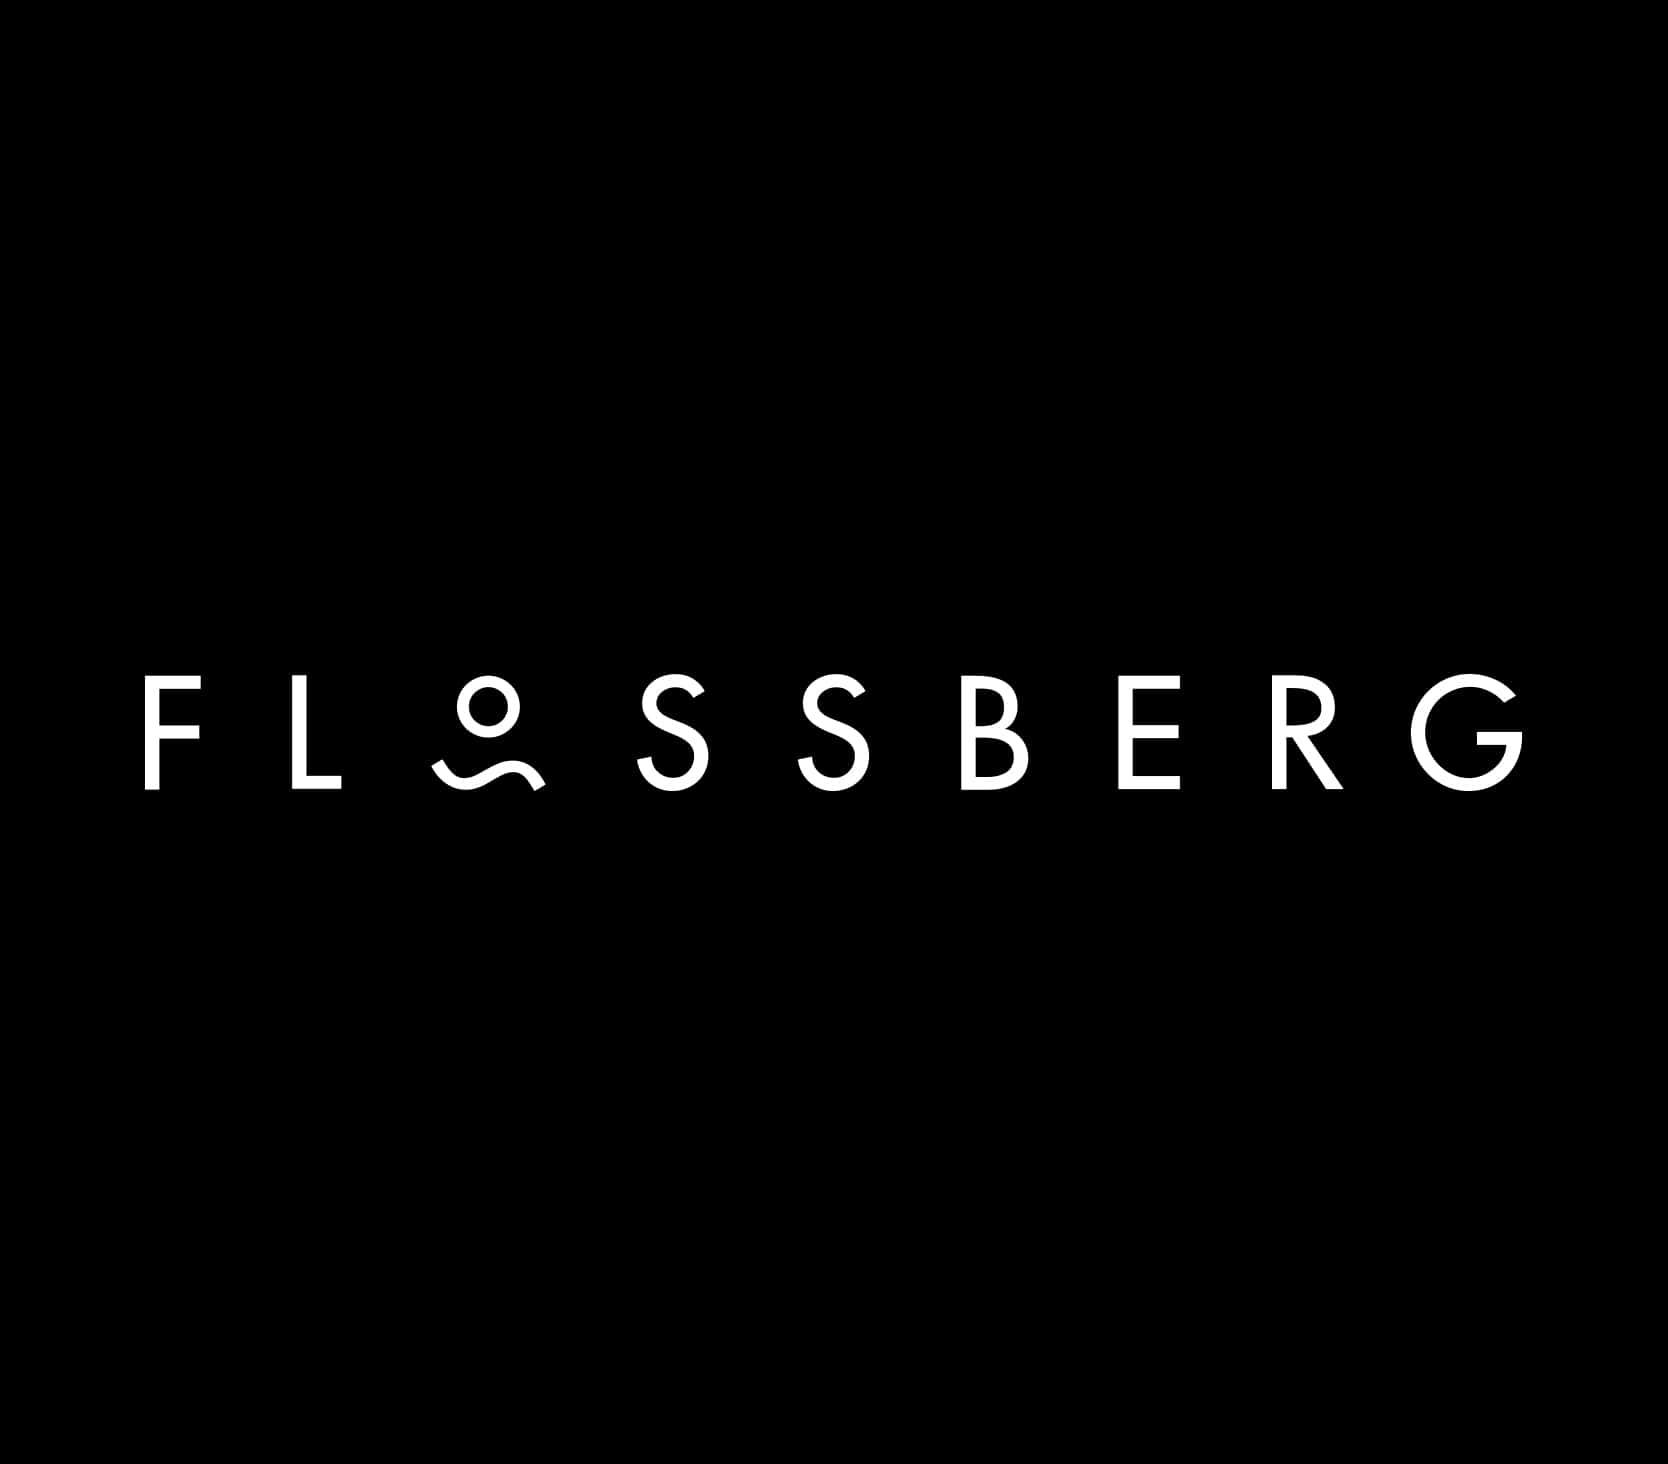 whateverworks-Leipzig-Flossberg-2